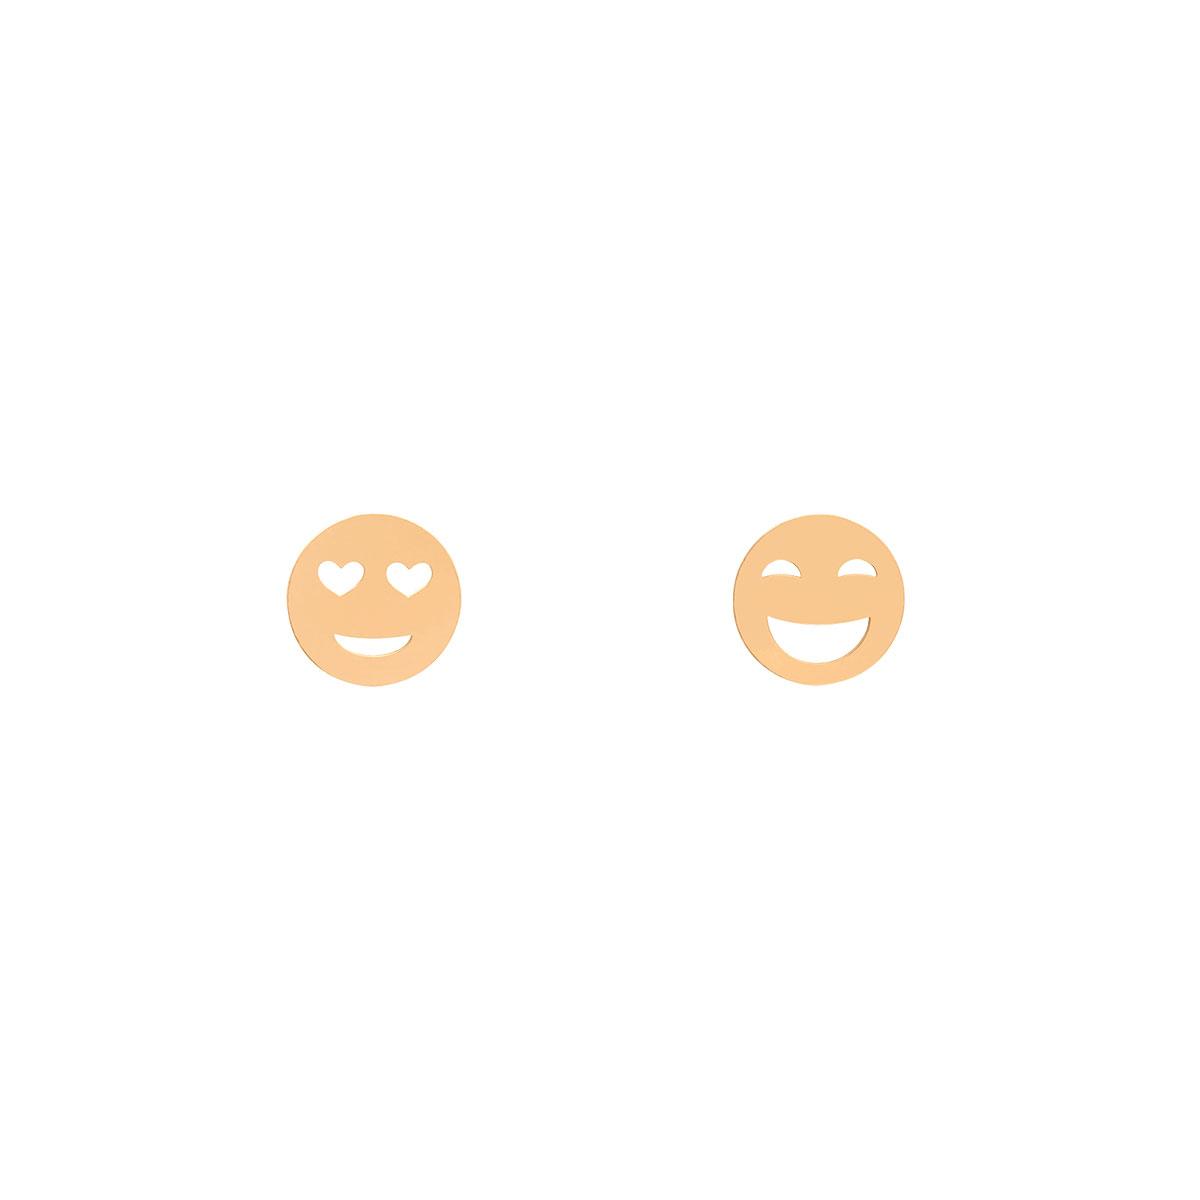 گوشواره Emoji